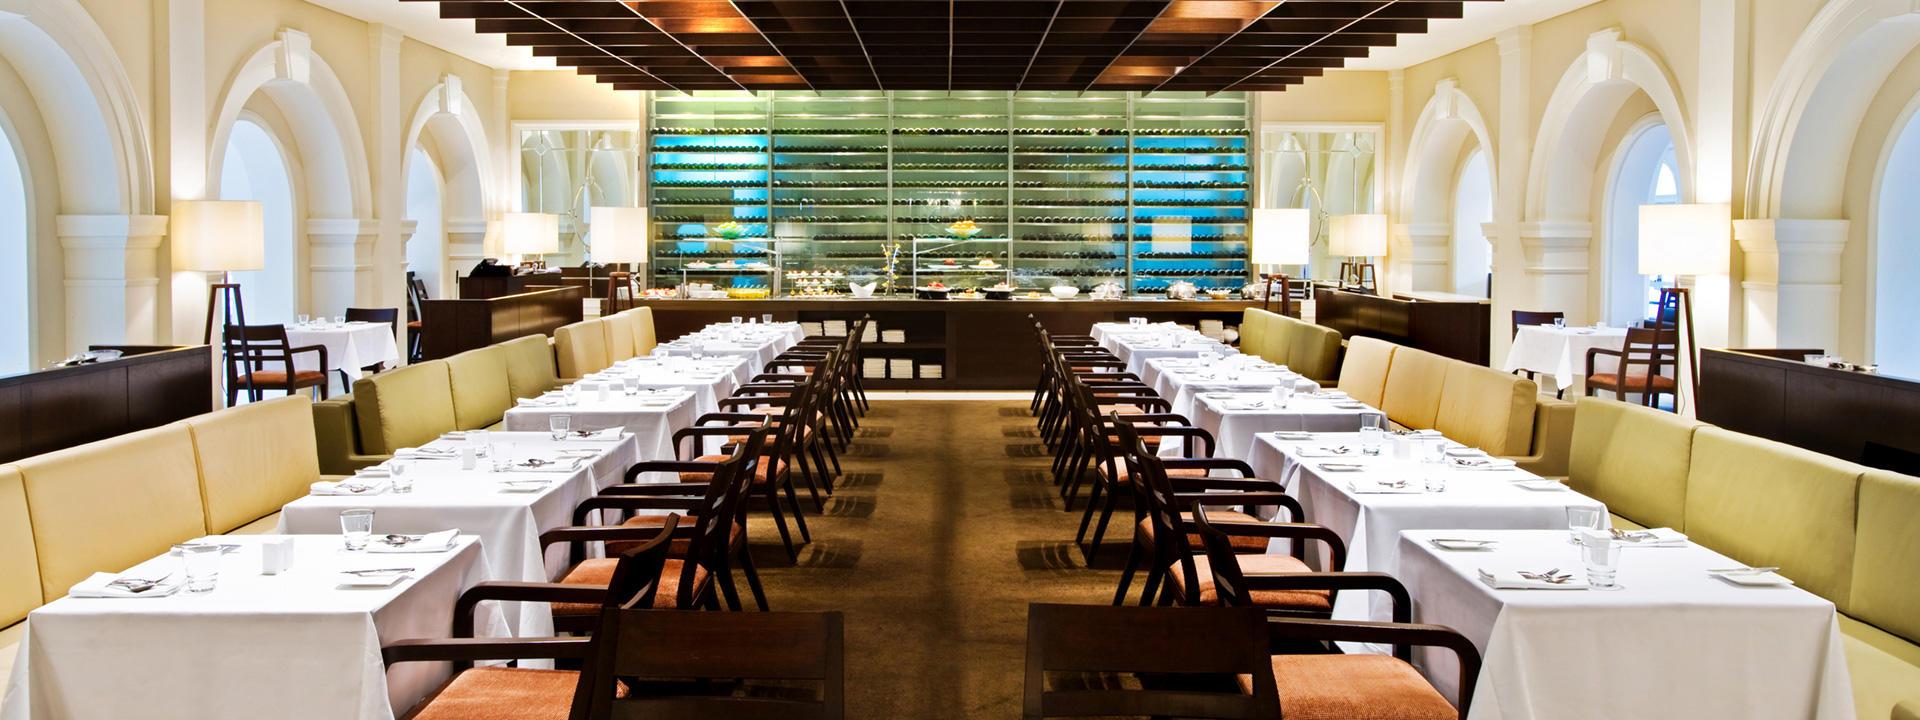 Restaurant - Goodwood Park Hotel